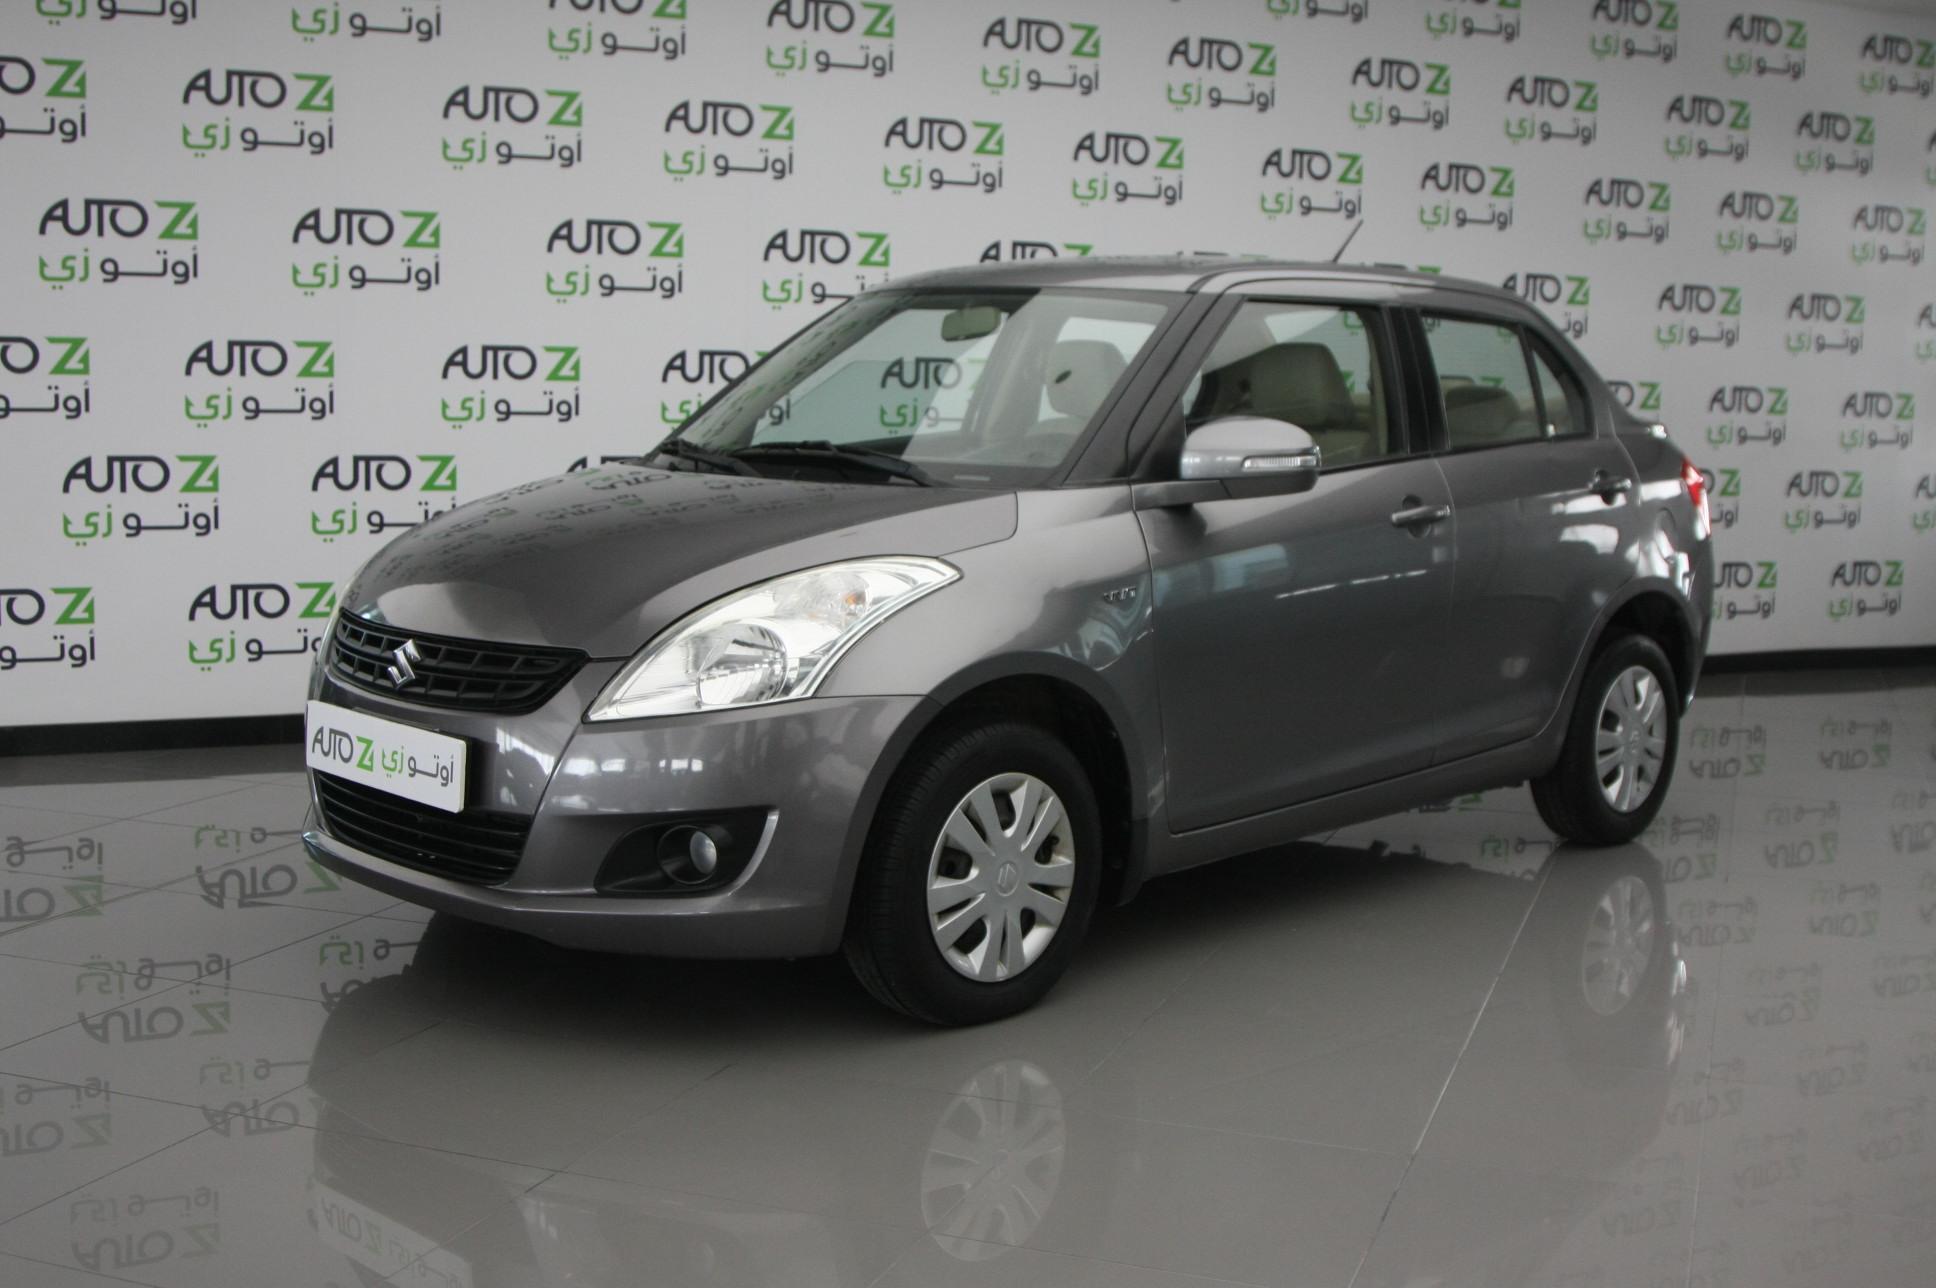 2014 Suzuki Dzire